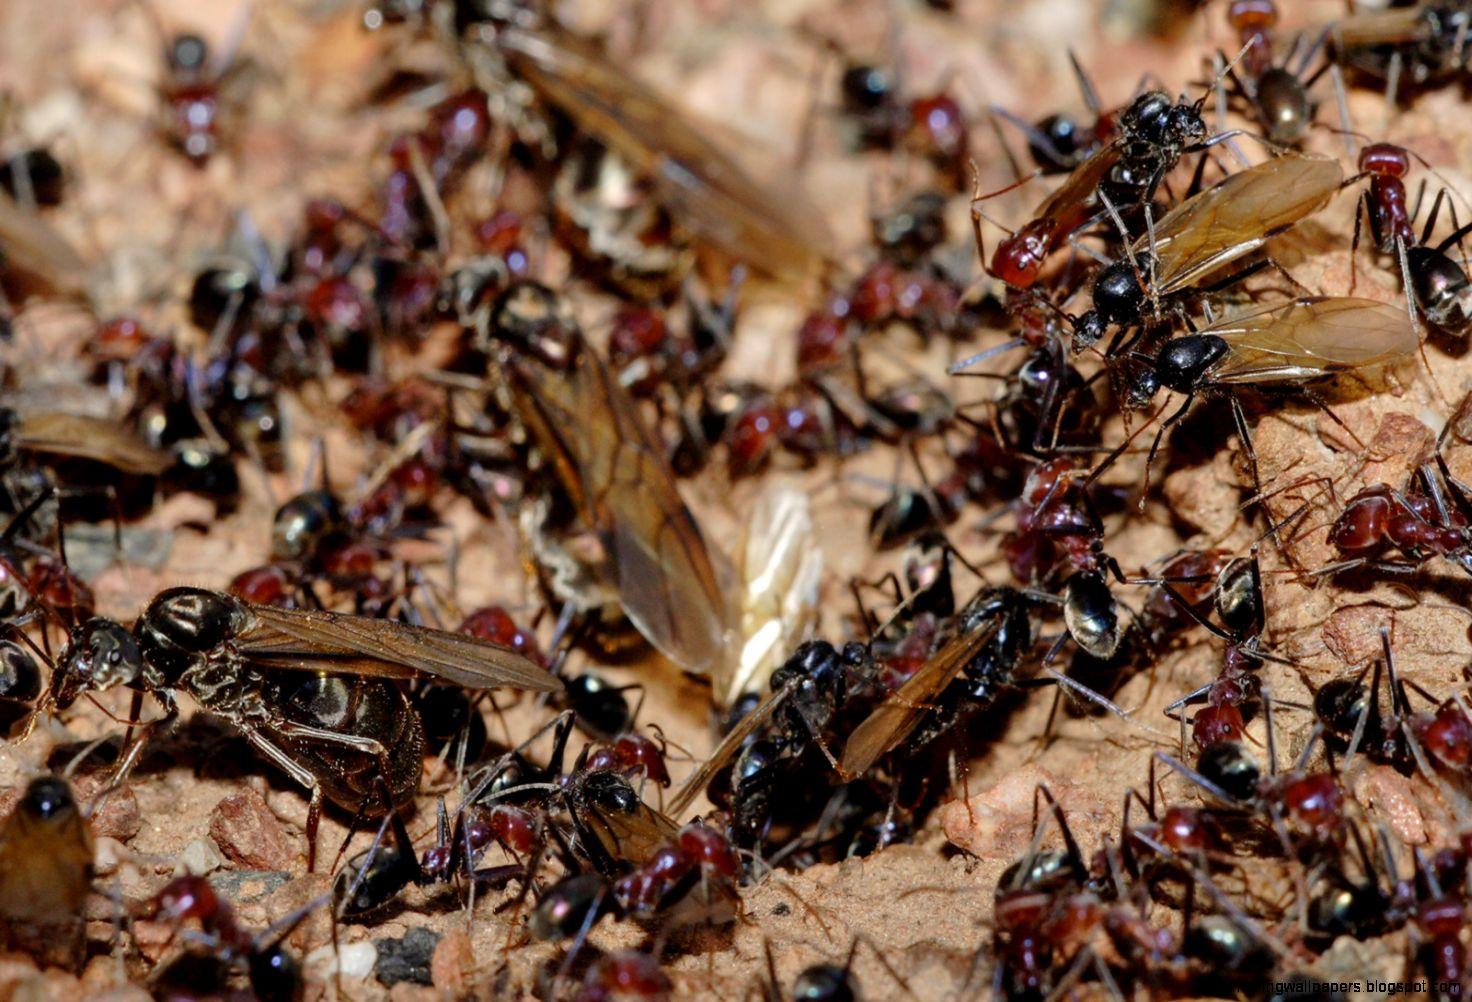 Ant   Wikipedia the free encyclopedia